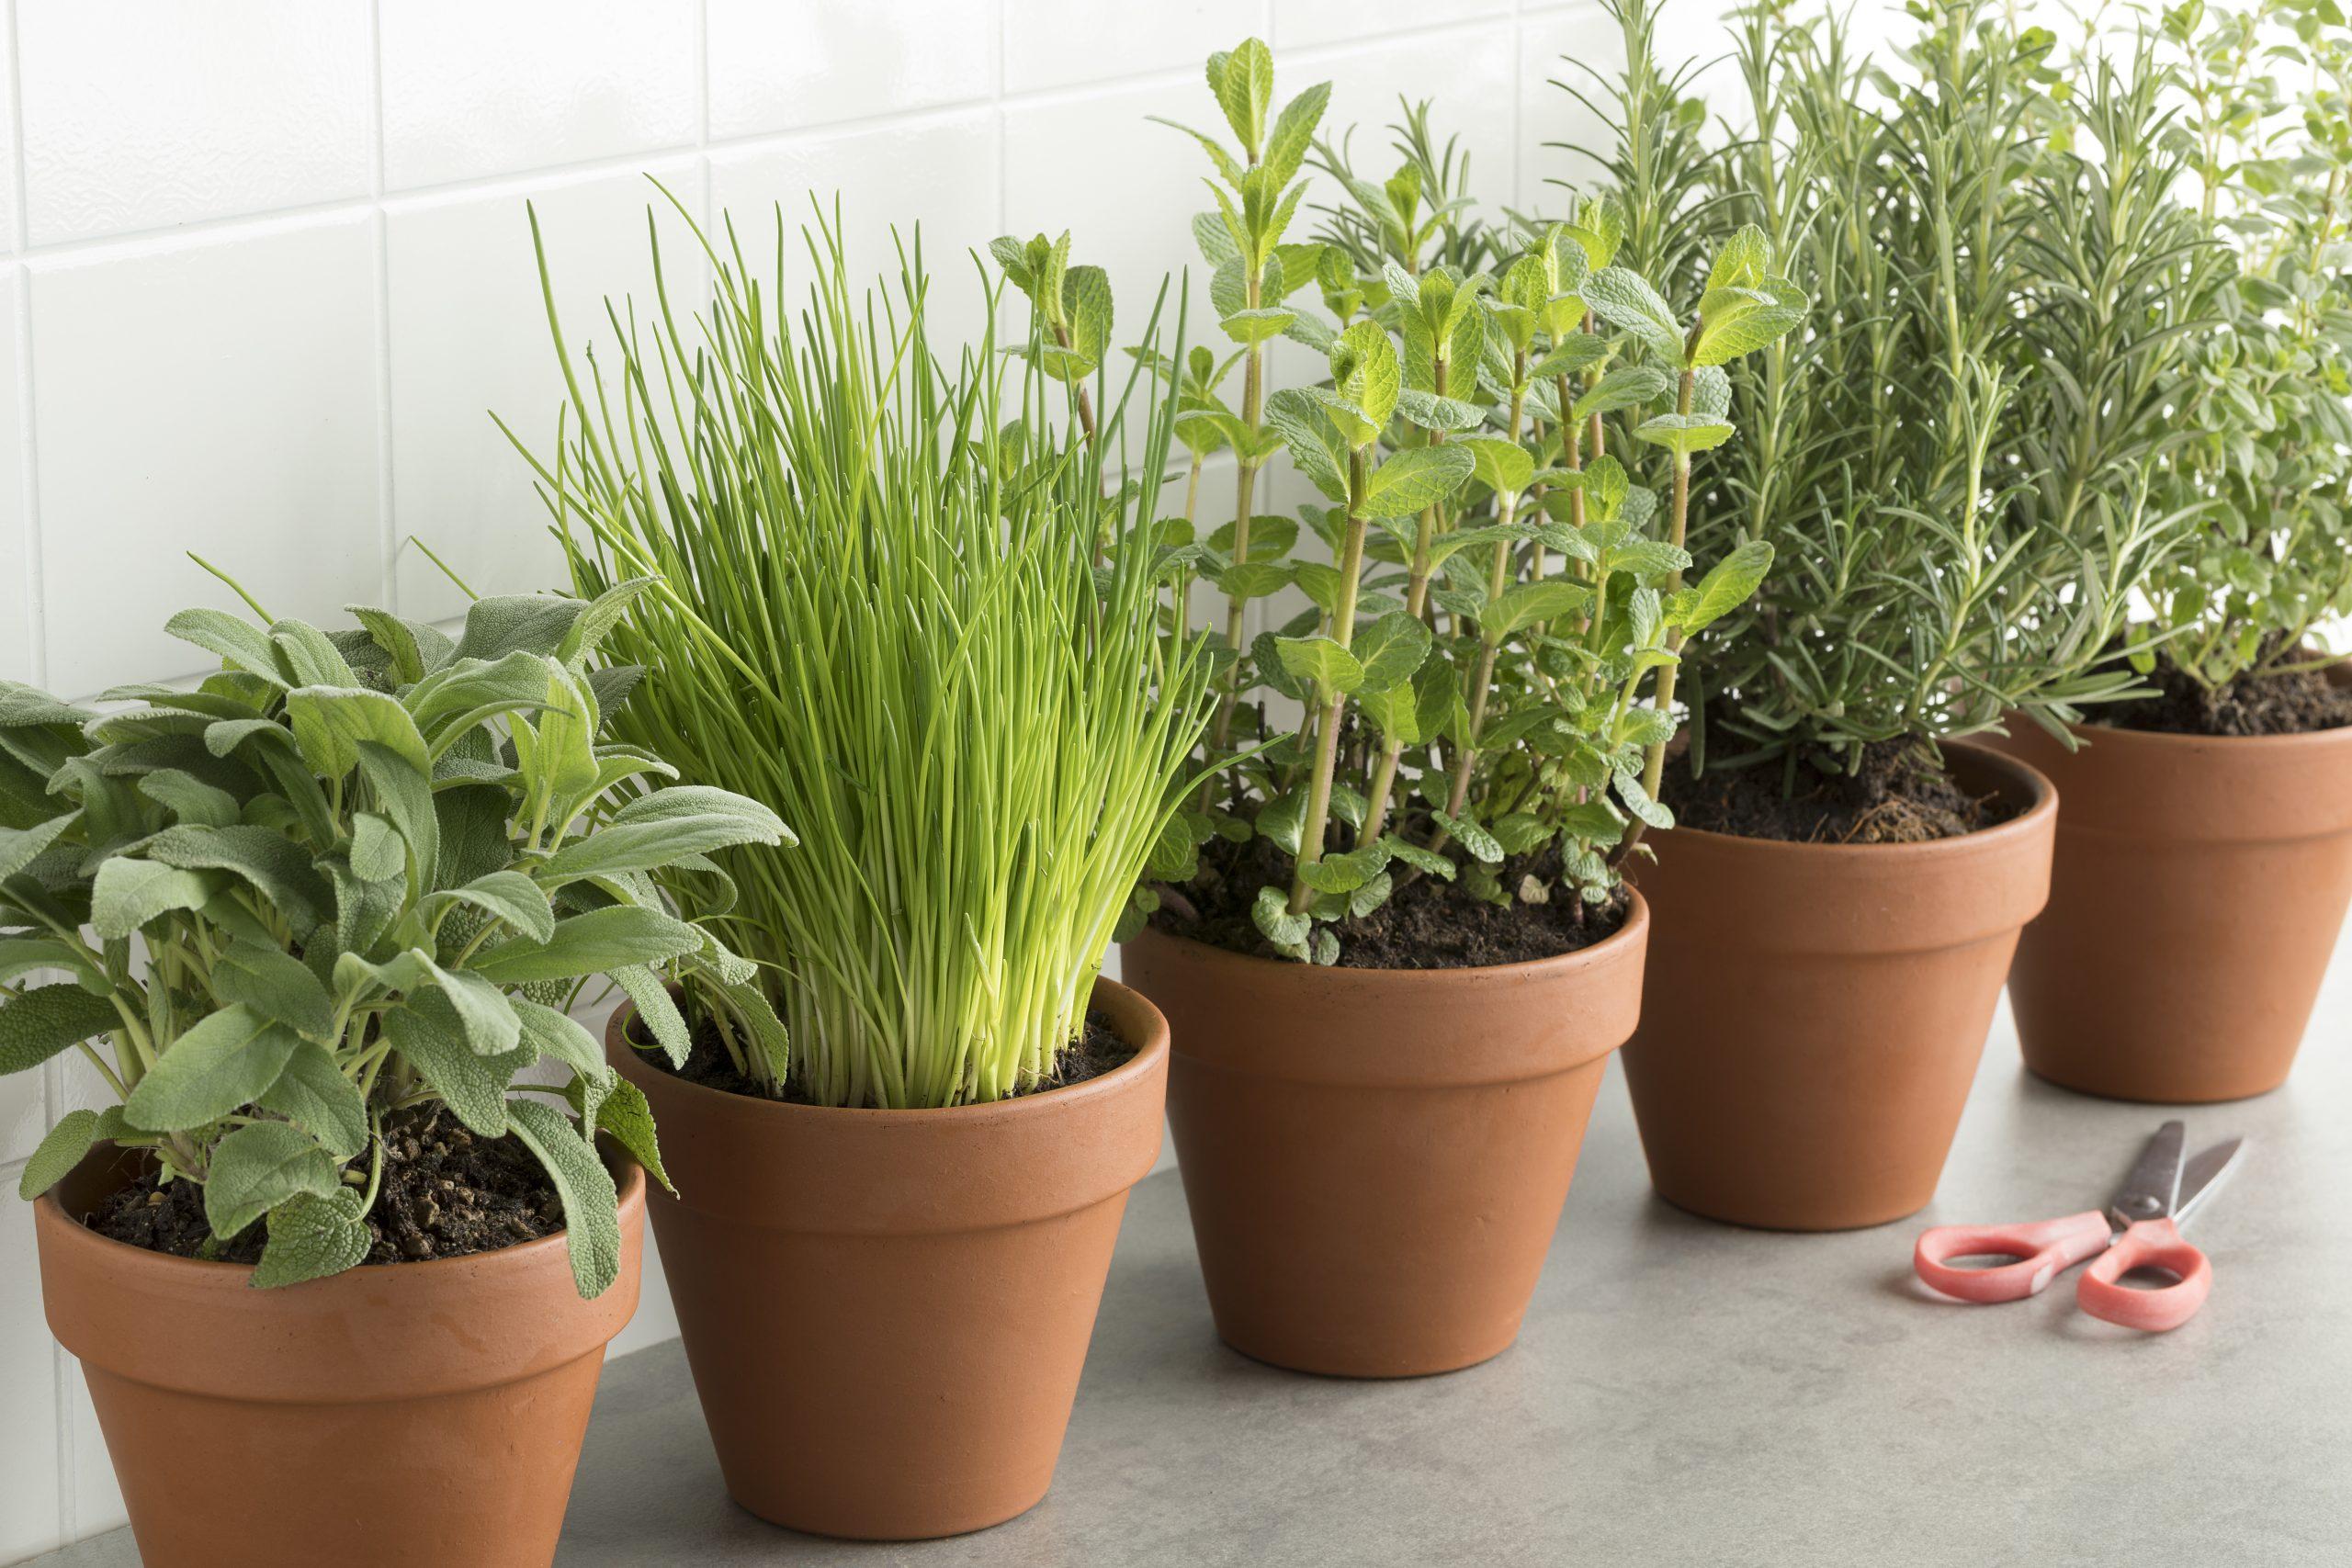 Full Size of Row Of Brown Terracotta Pots With Fresh Herbs Küche Kräutergarten Küche